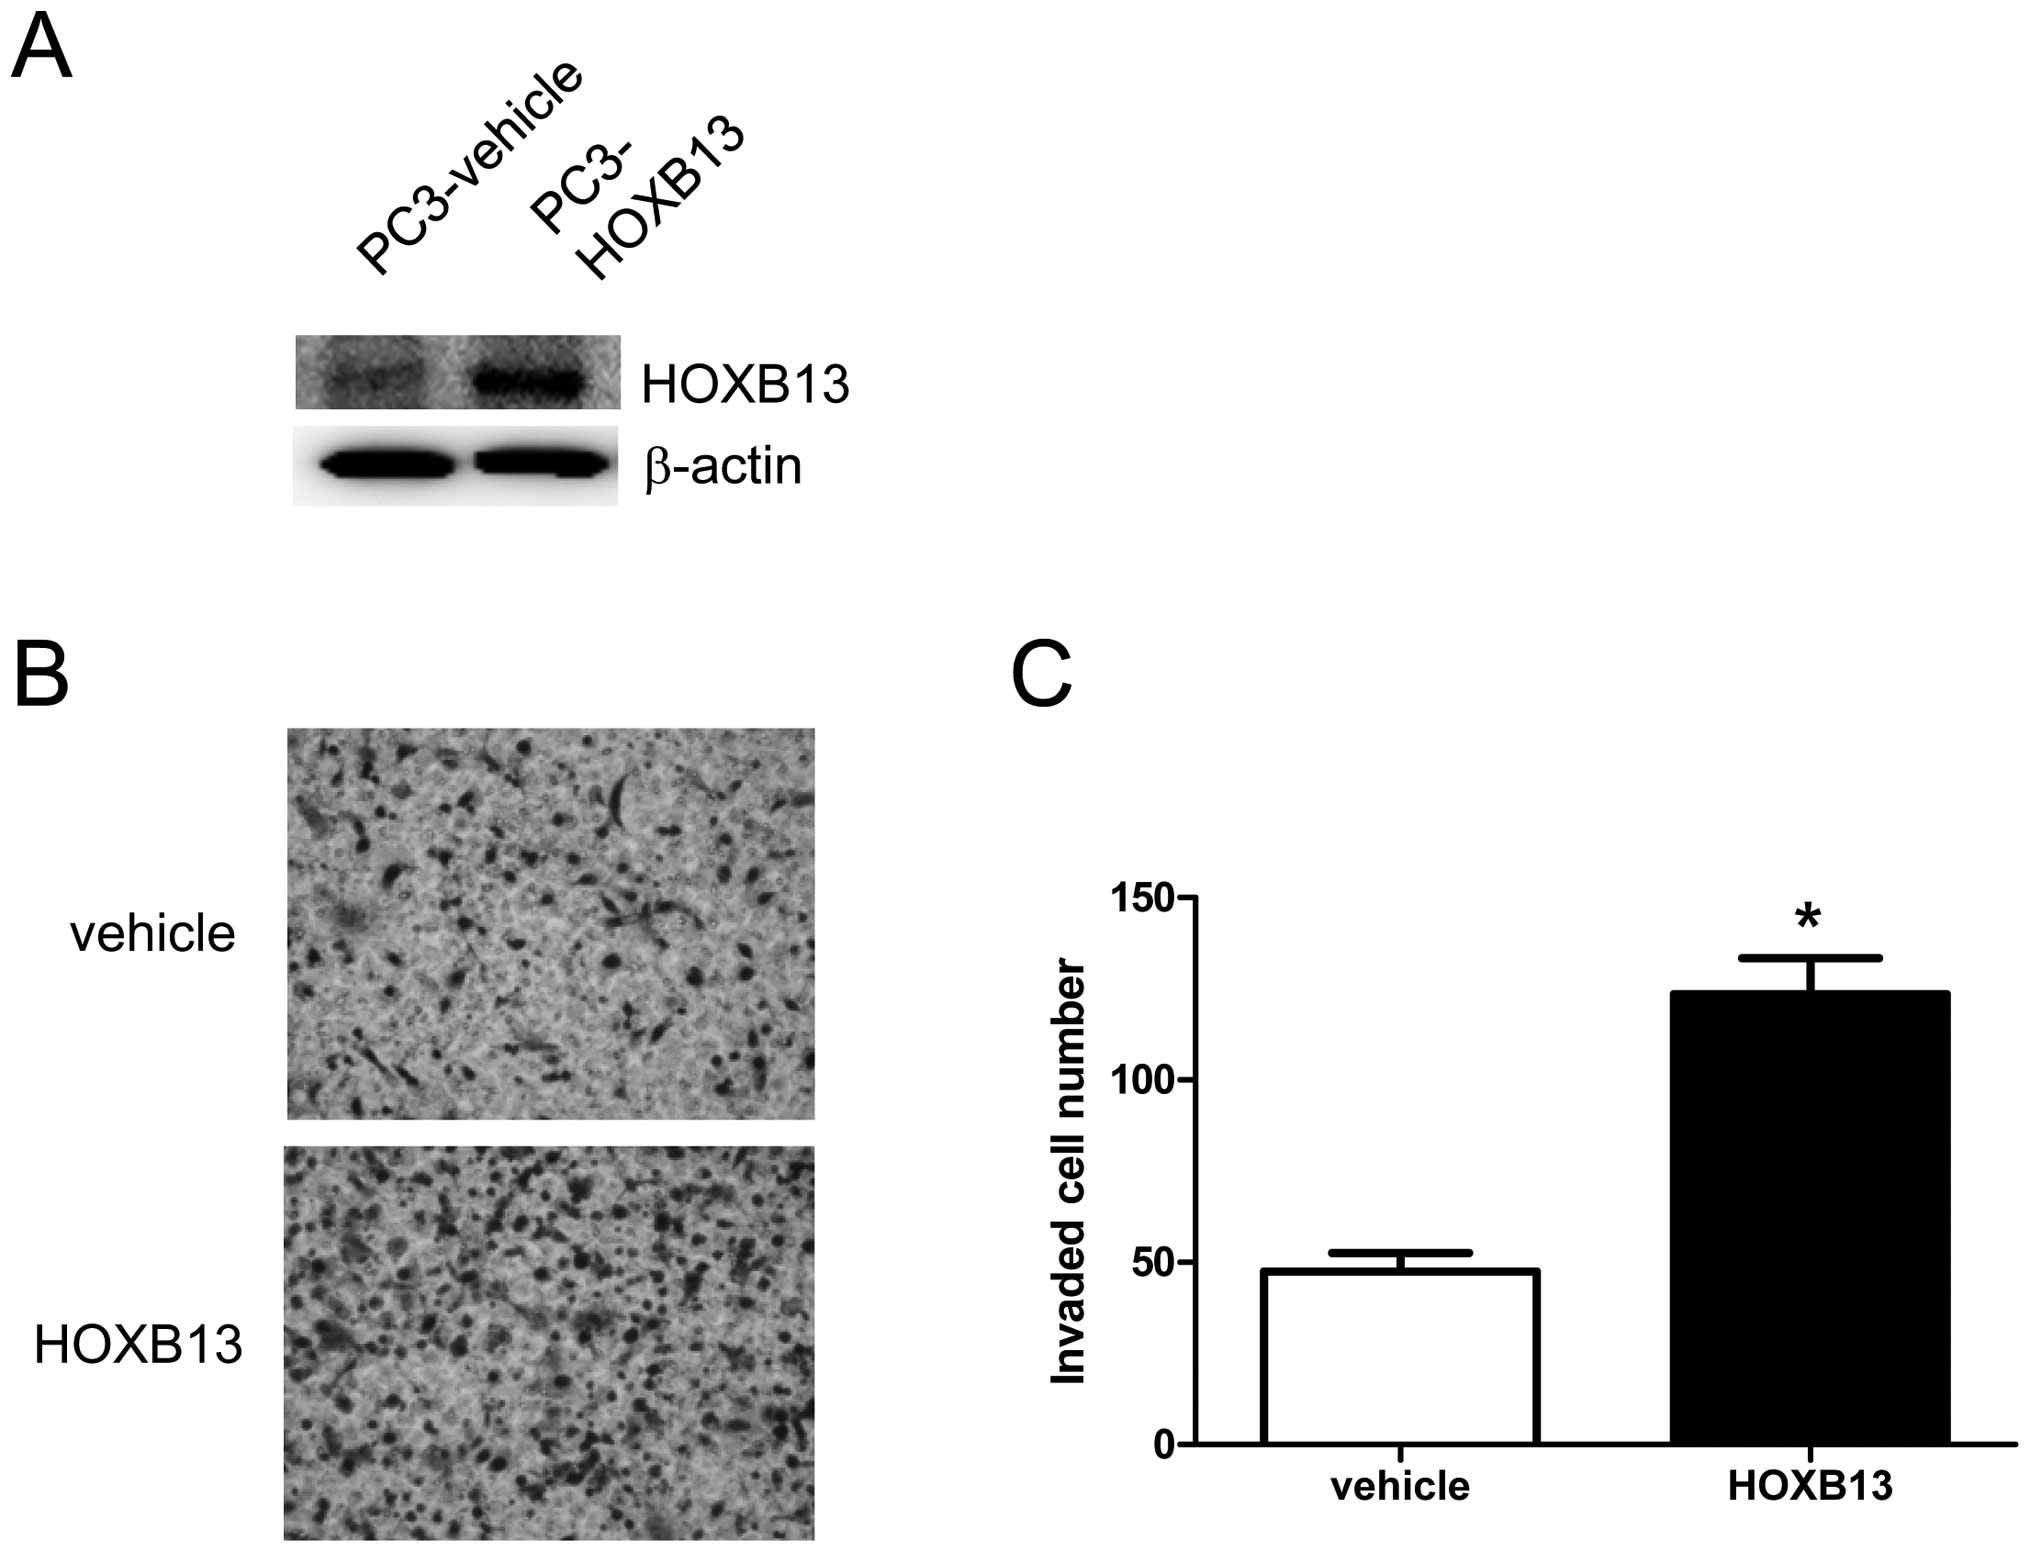 cáncer de próstata del gen hoxb13